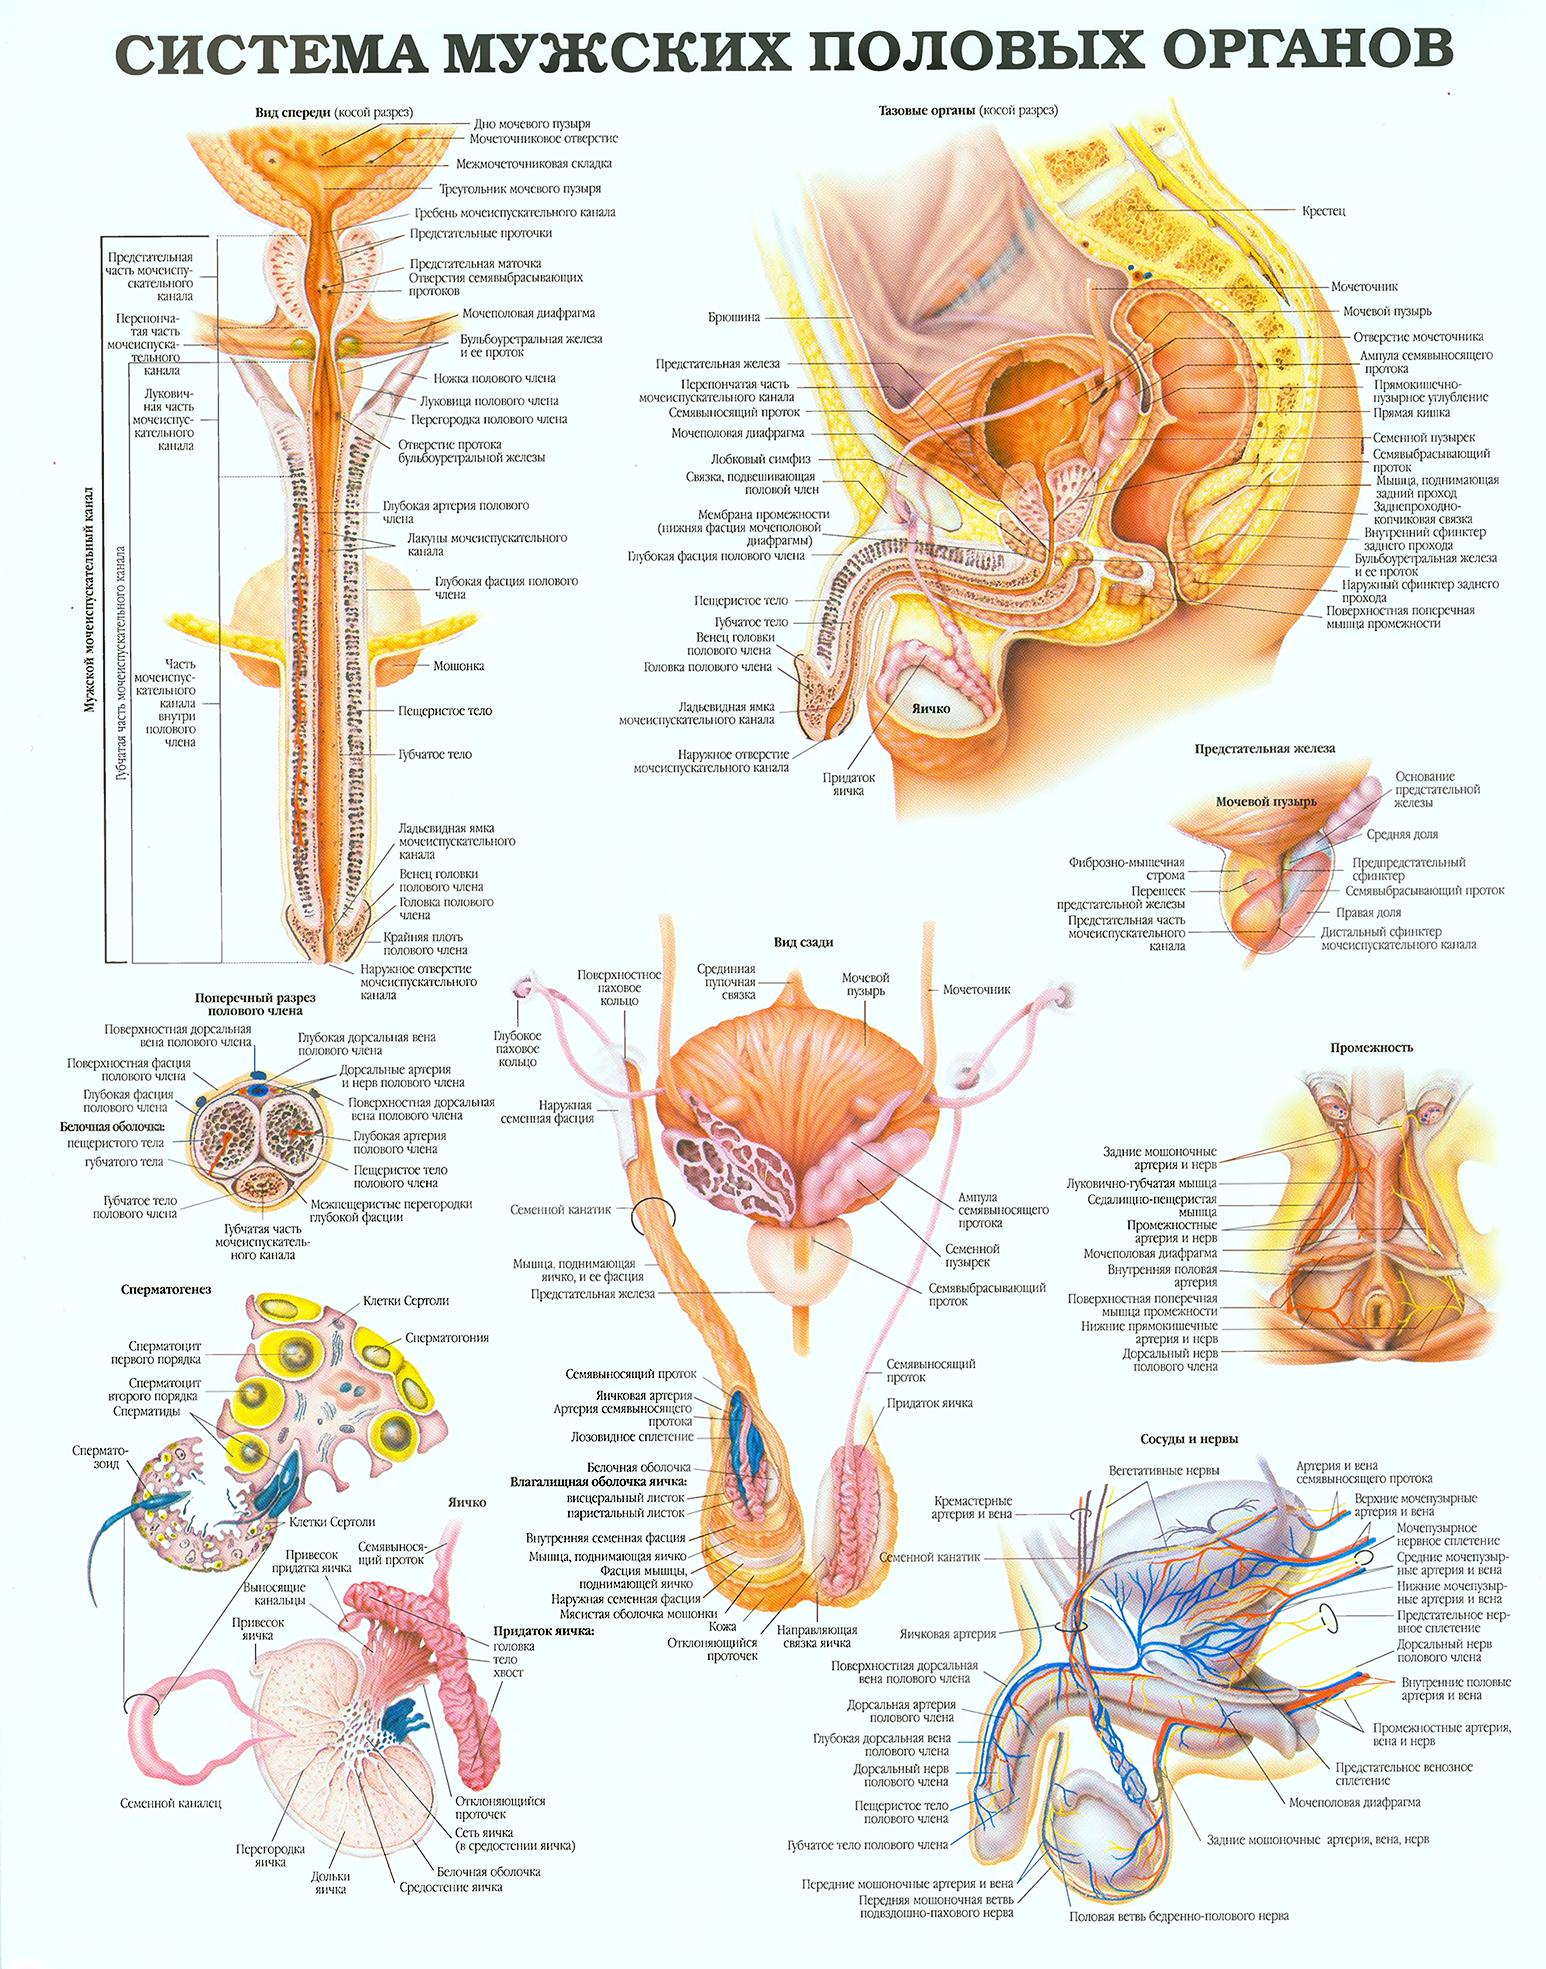 berkova-pokazivaet-stroenie-polovih-organov-vaginu-ochen-polnih